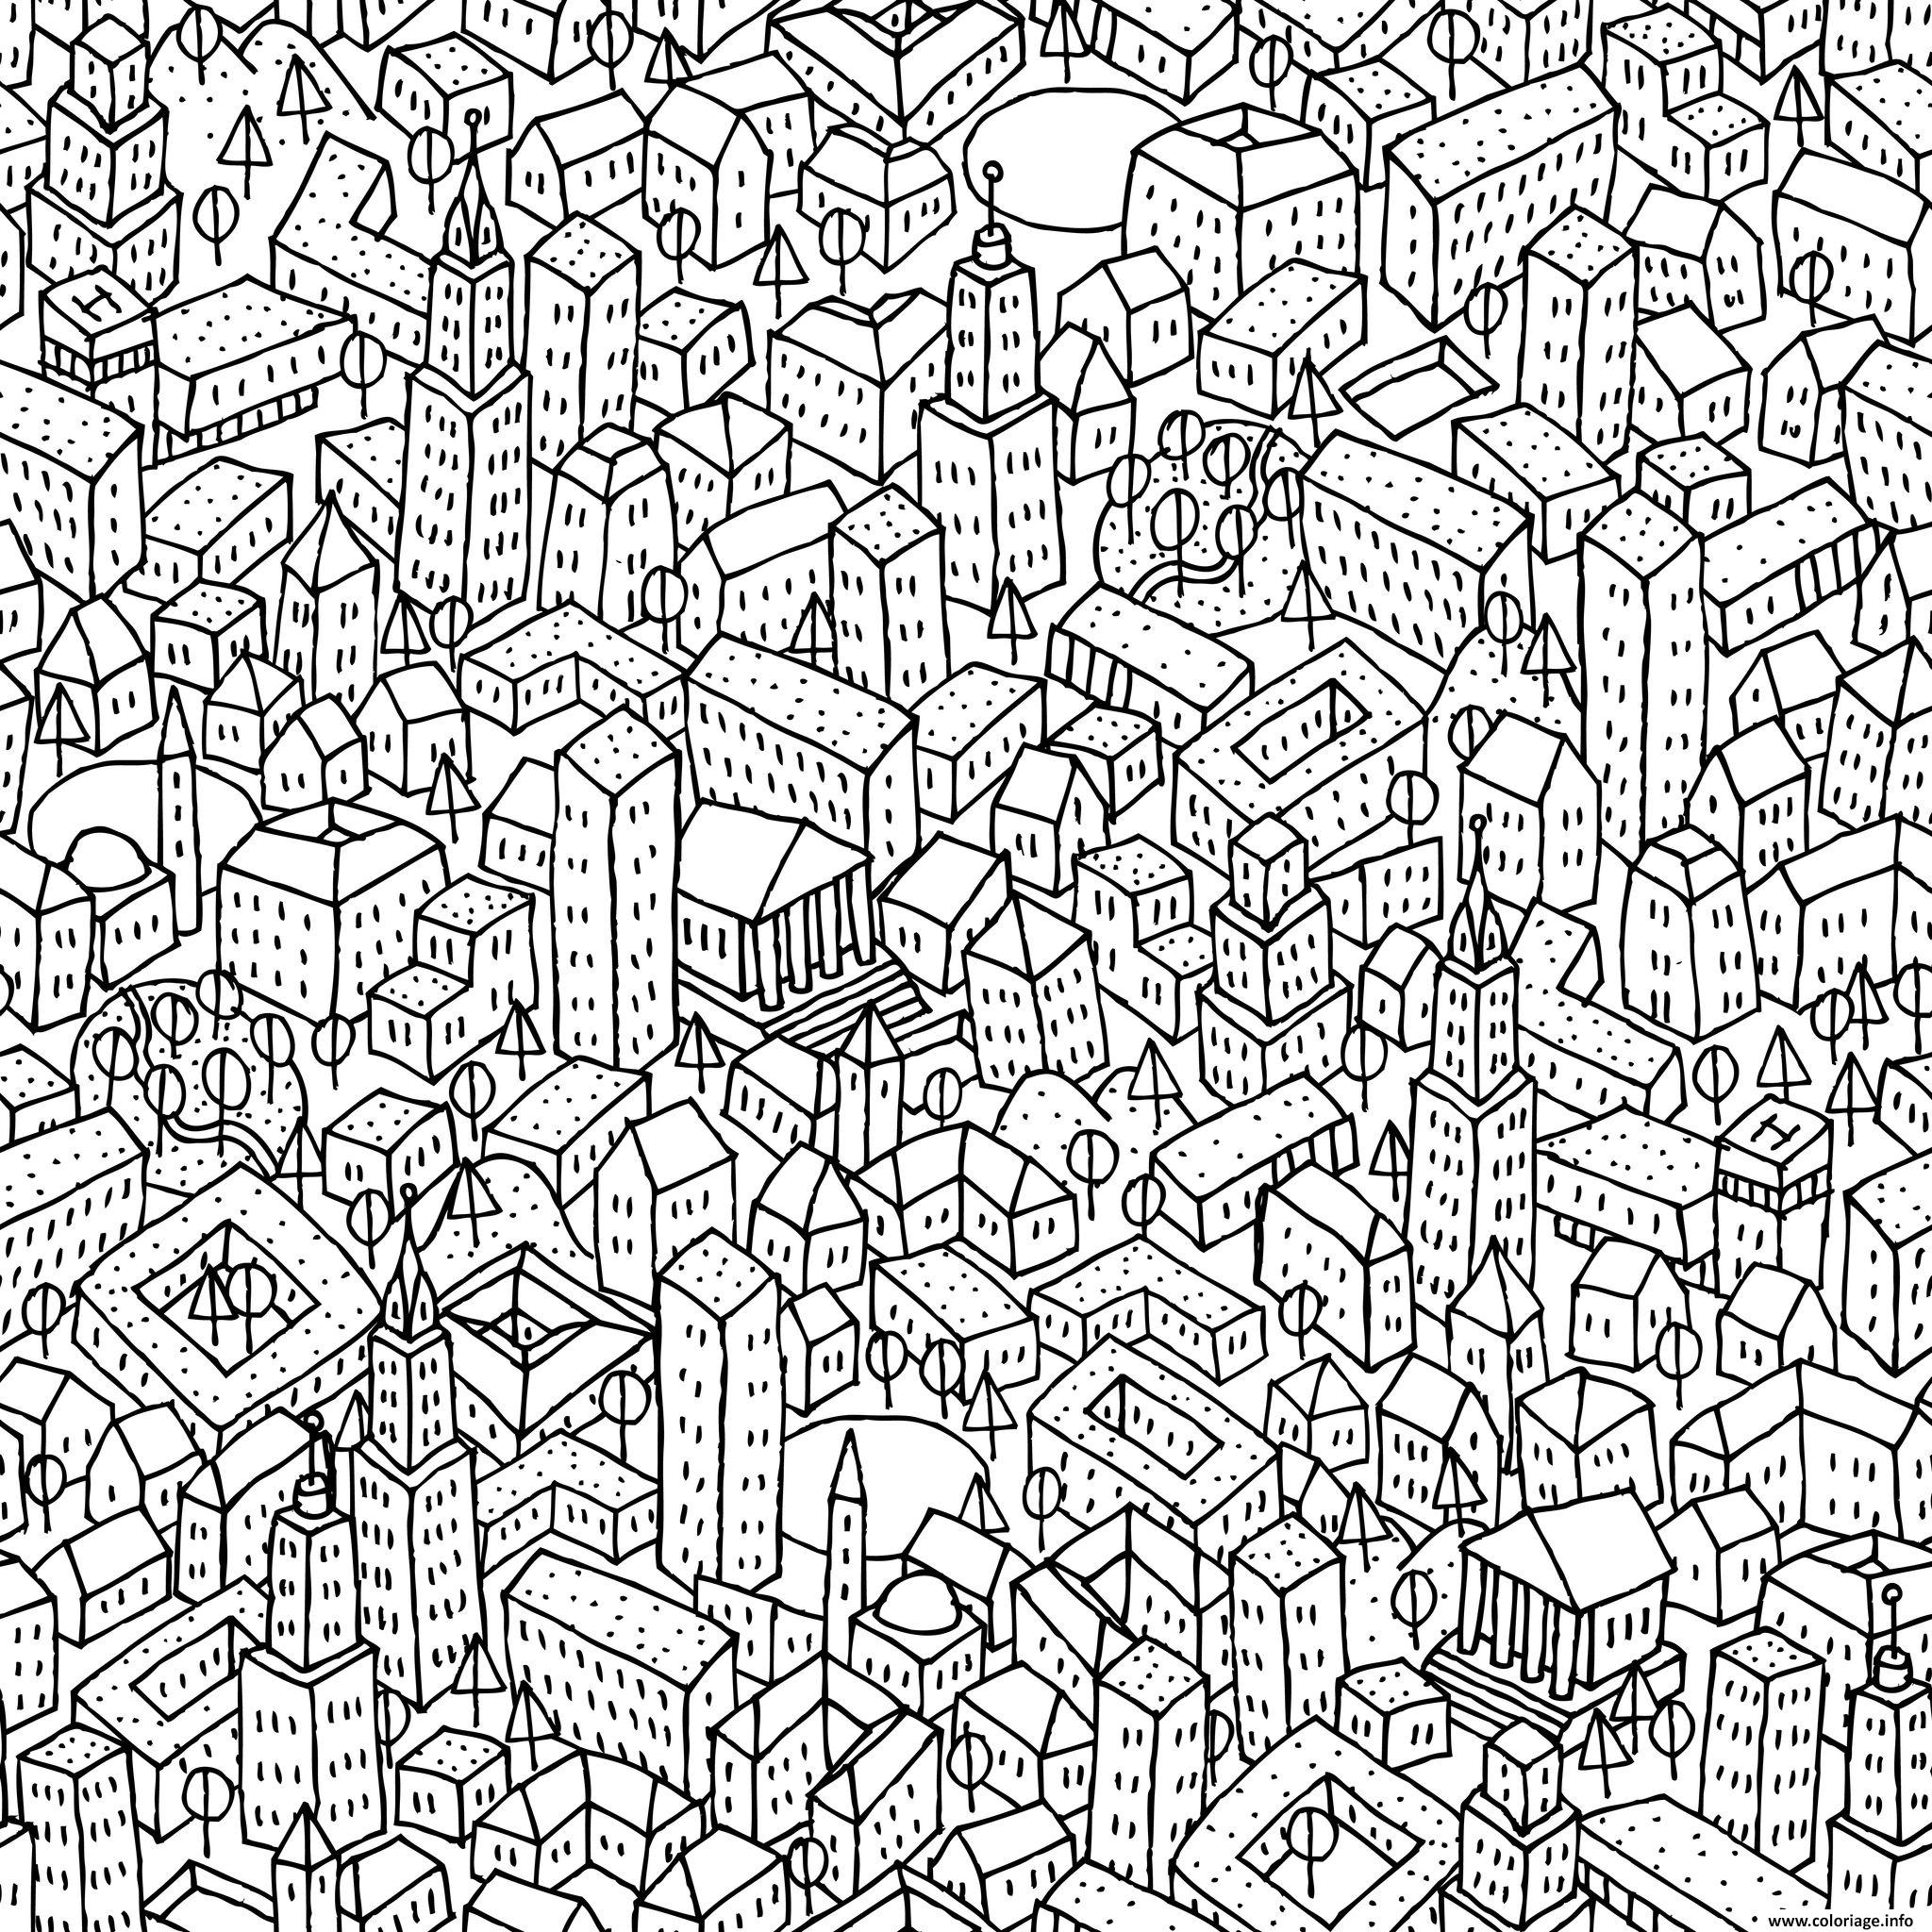 Coloriage anti stress ville paysage dessin - Dessin anti stress a imprimer ...